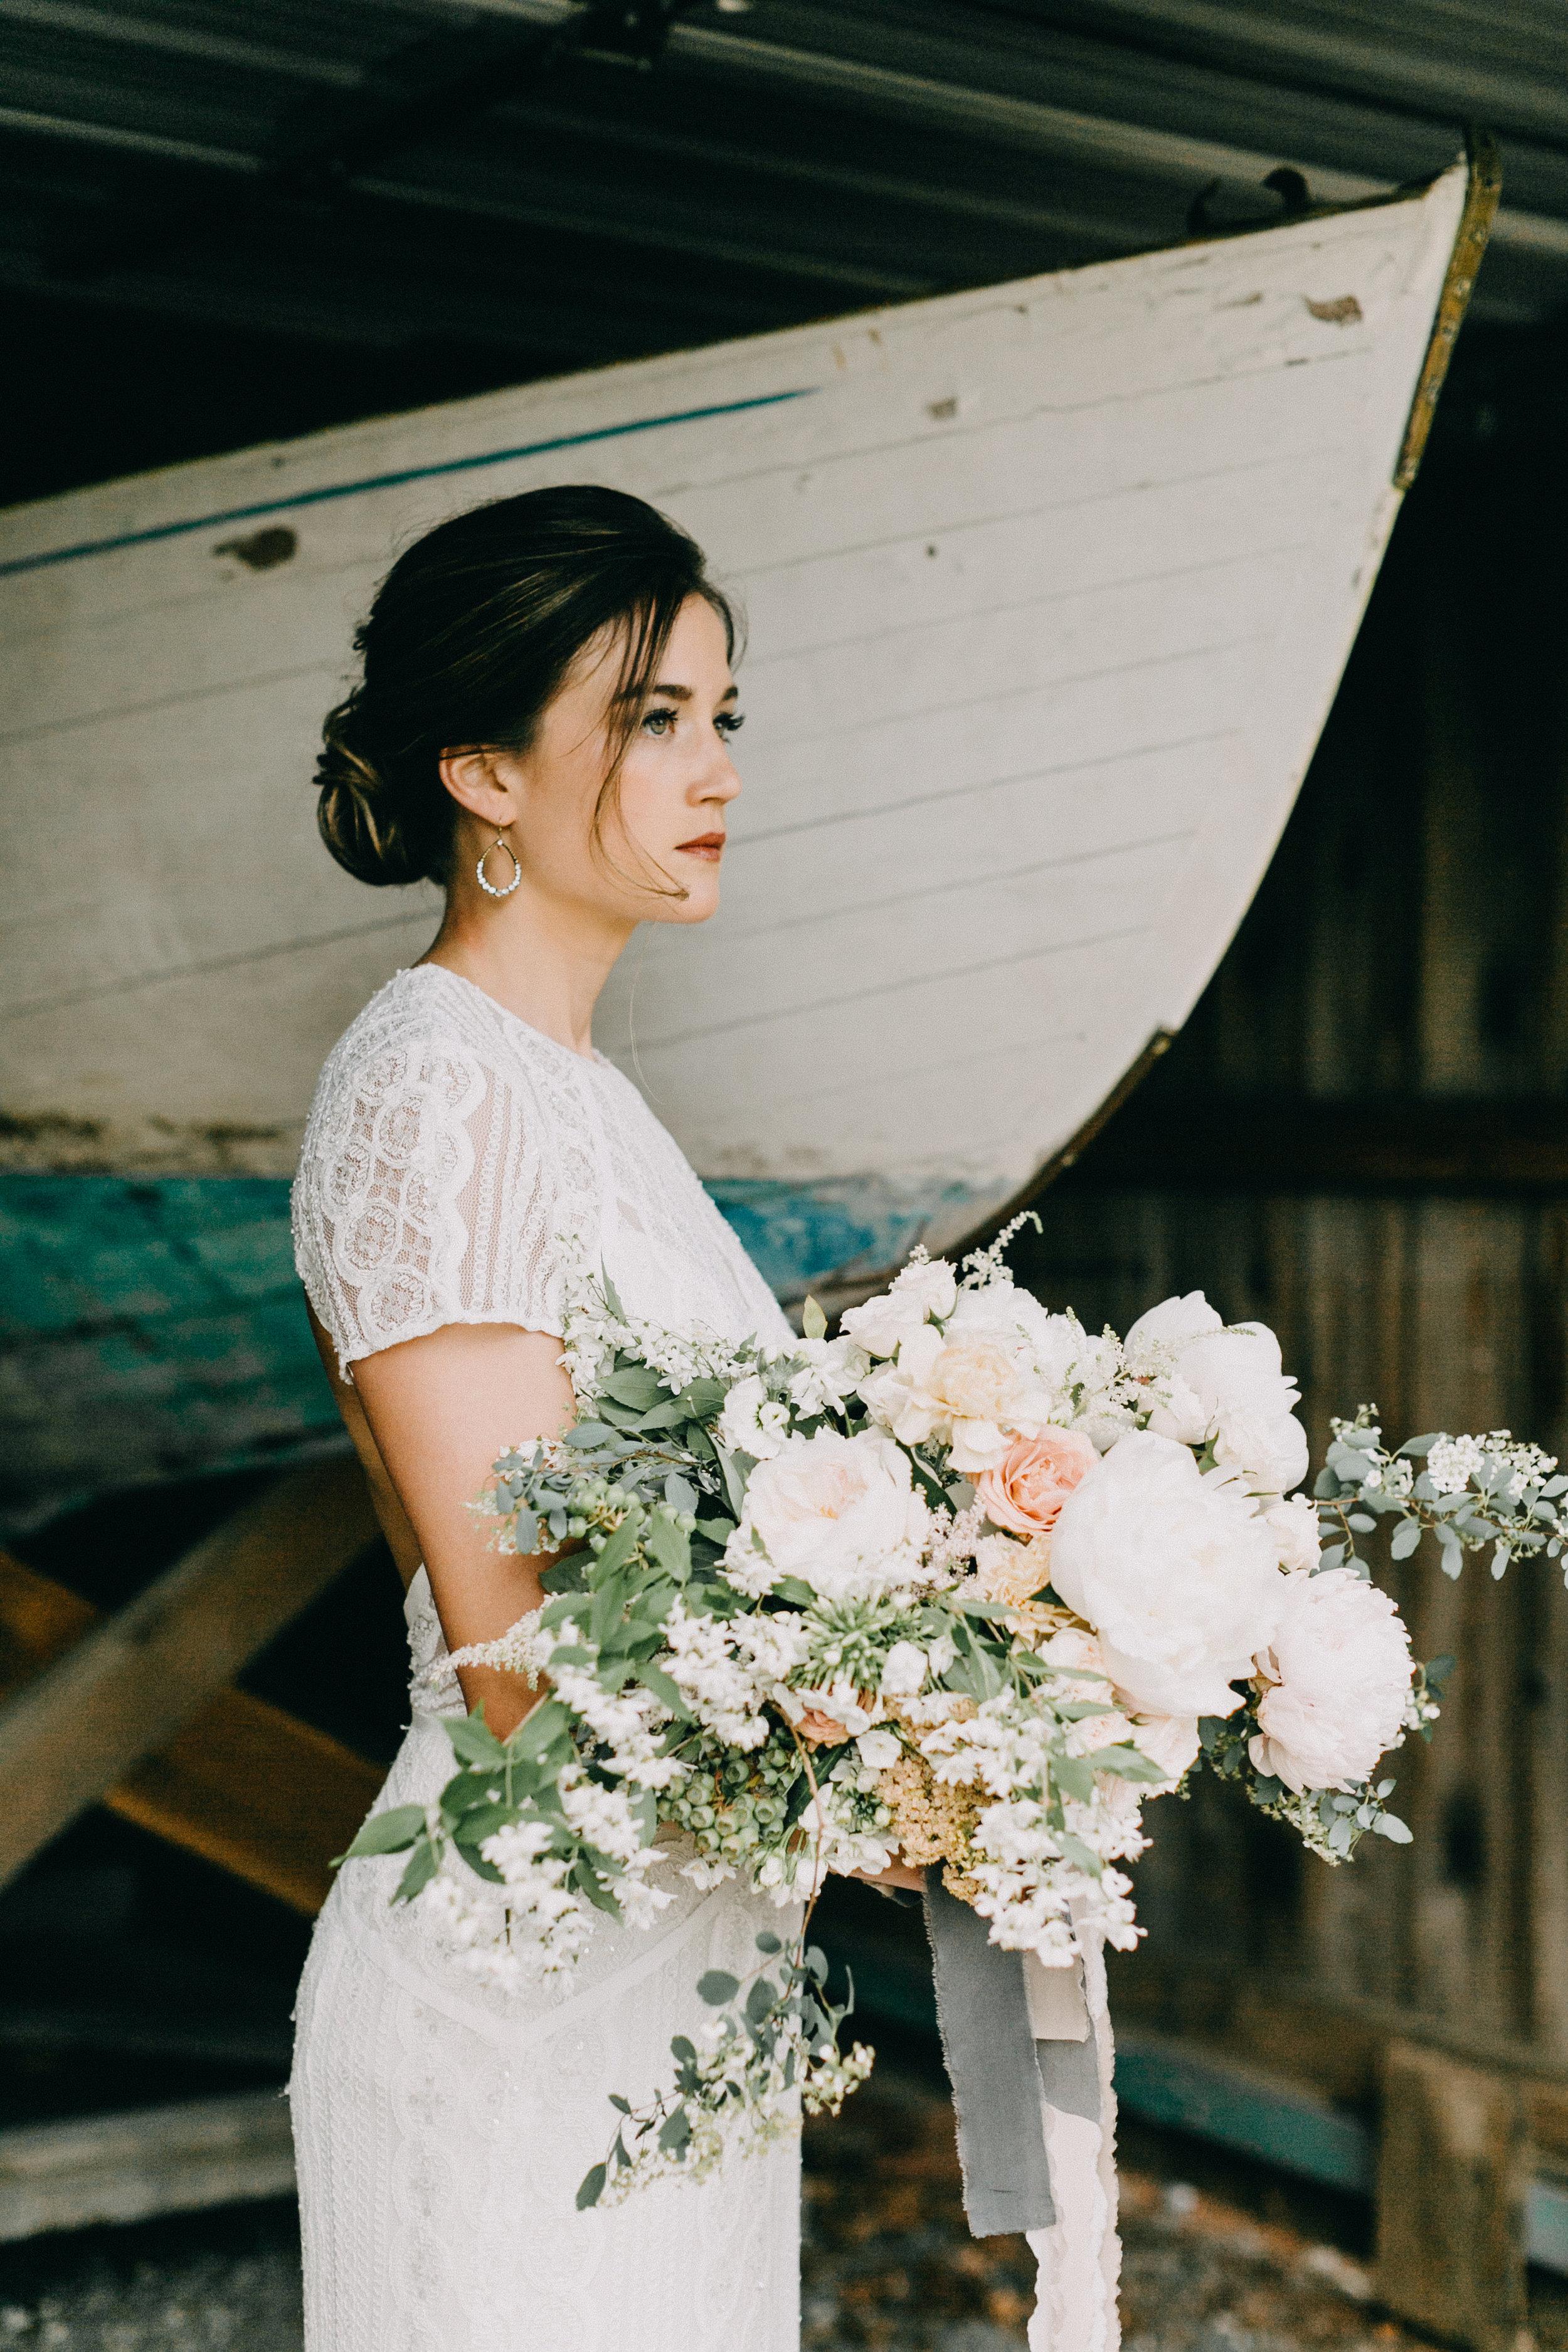 Watershed-Floral-Maine-Maritime-Wedding-Bridal-Bouquet-Centerpieces-0124.jpg